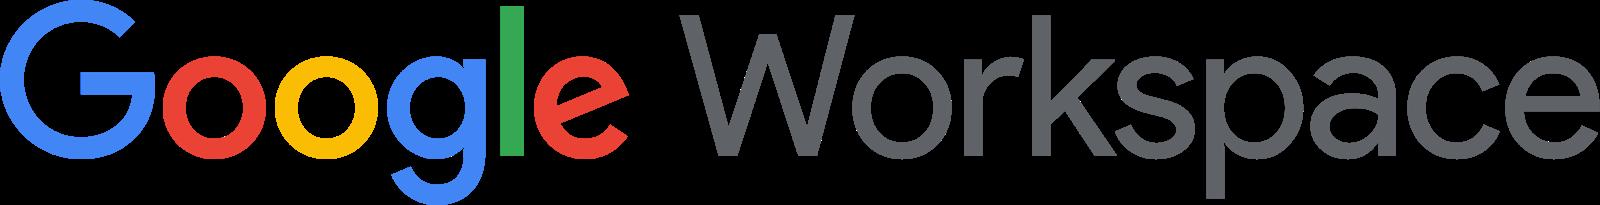 Google Workspace - Full color